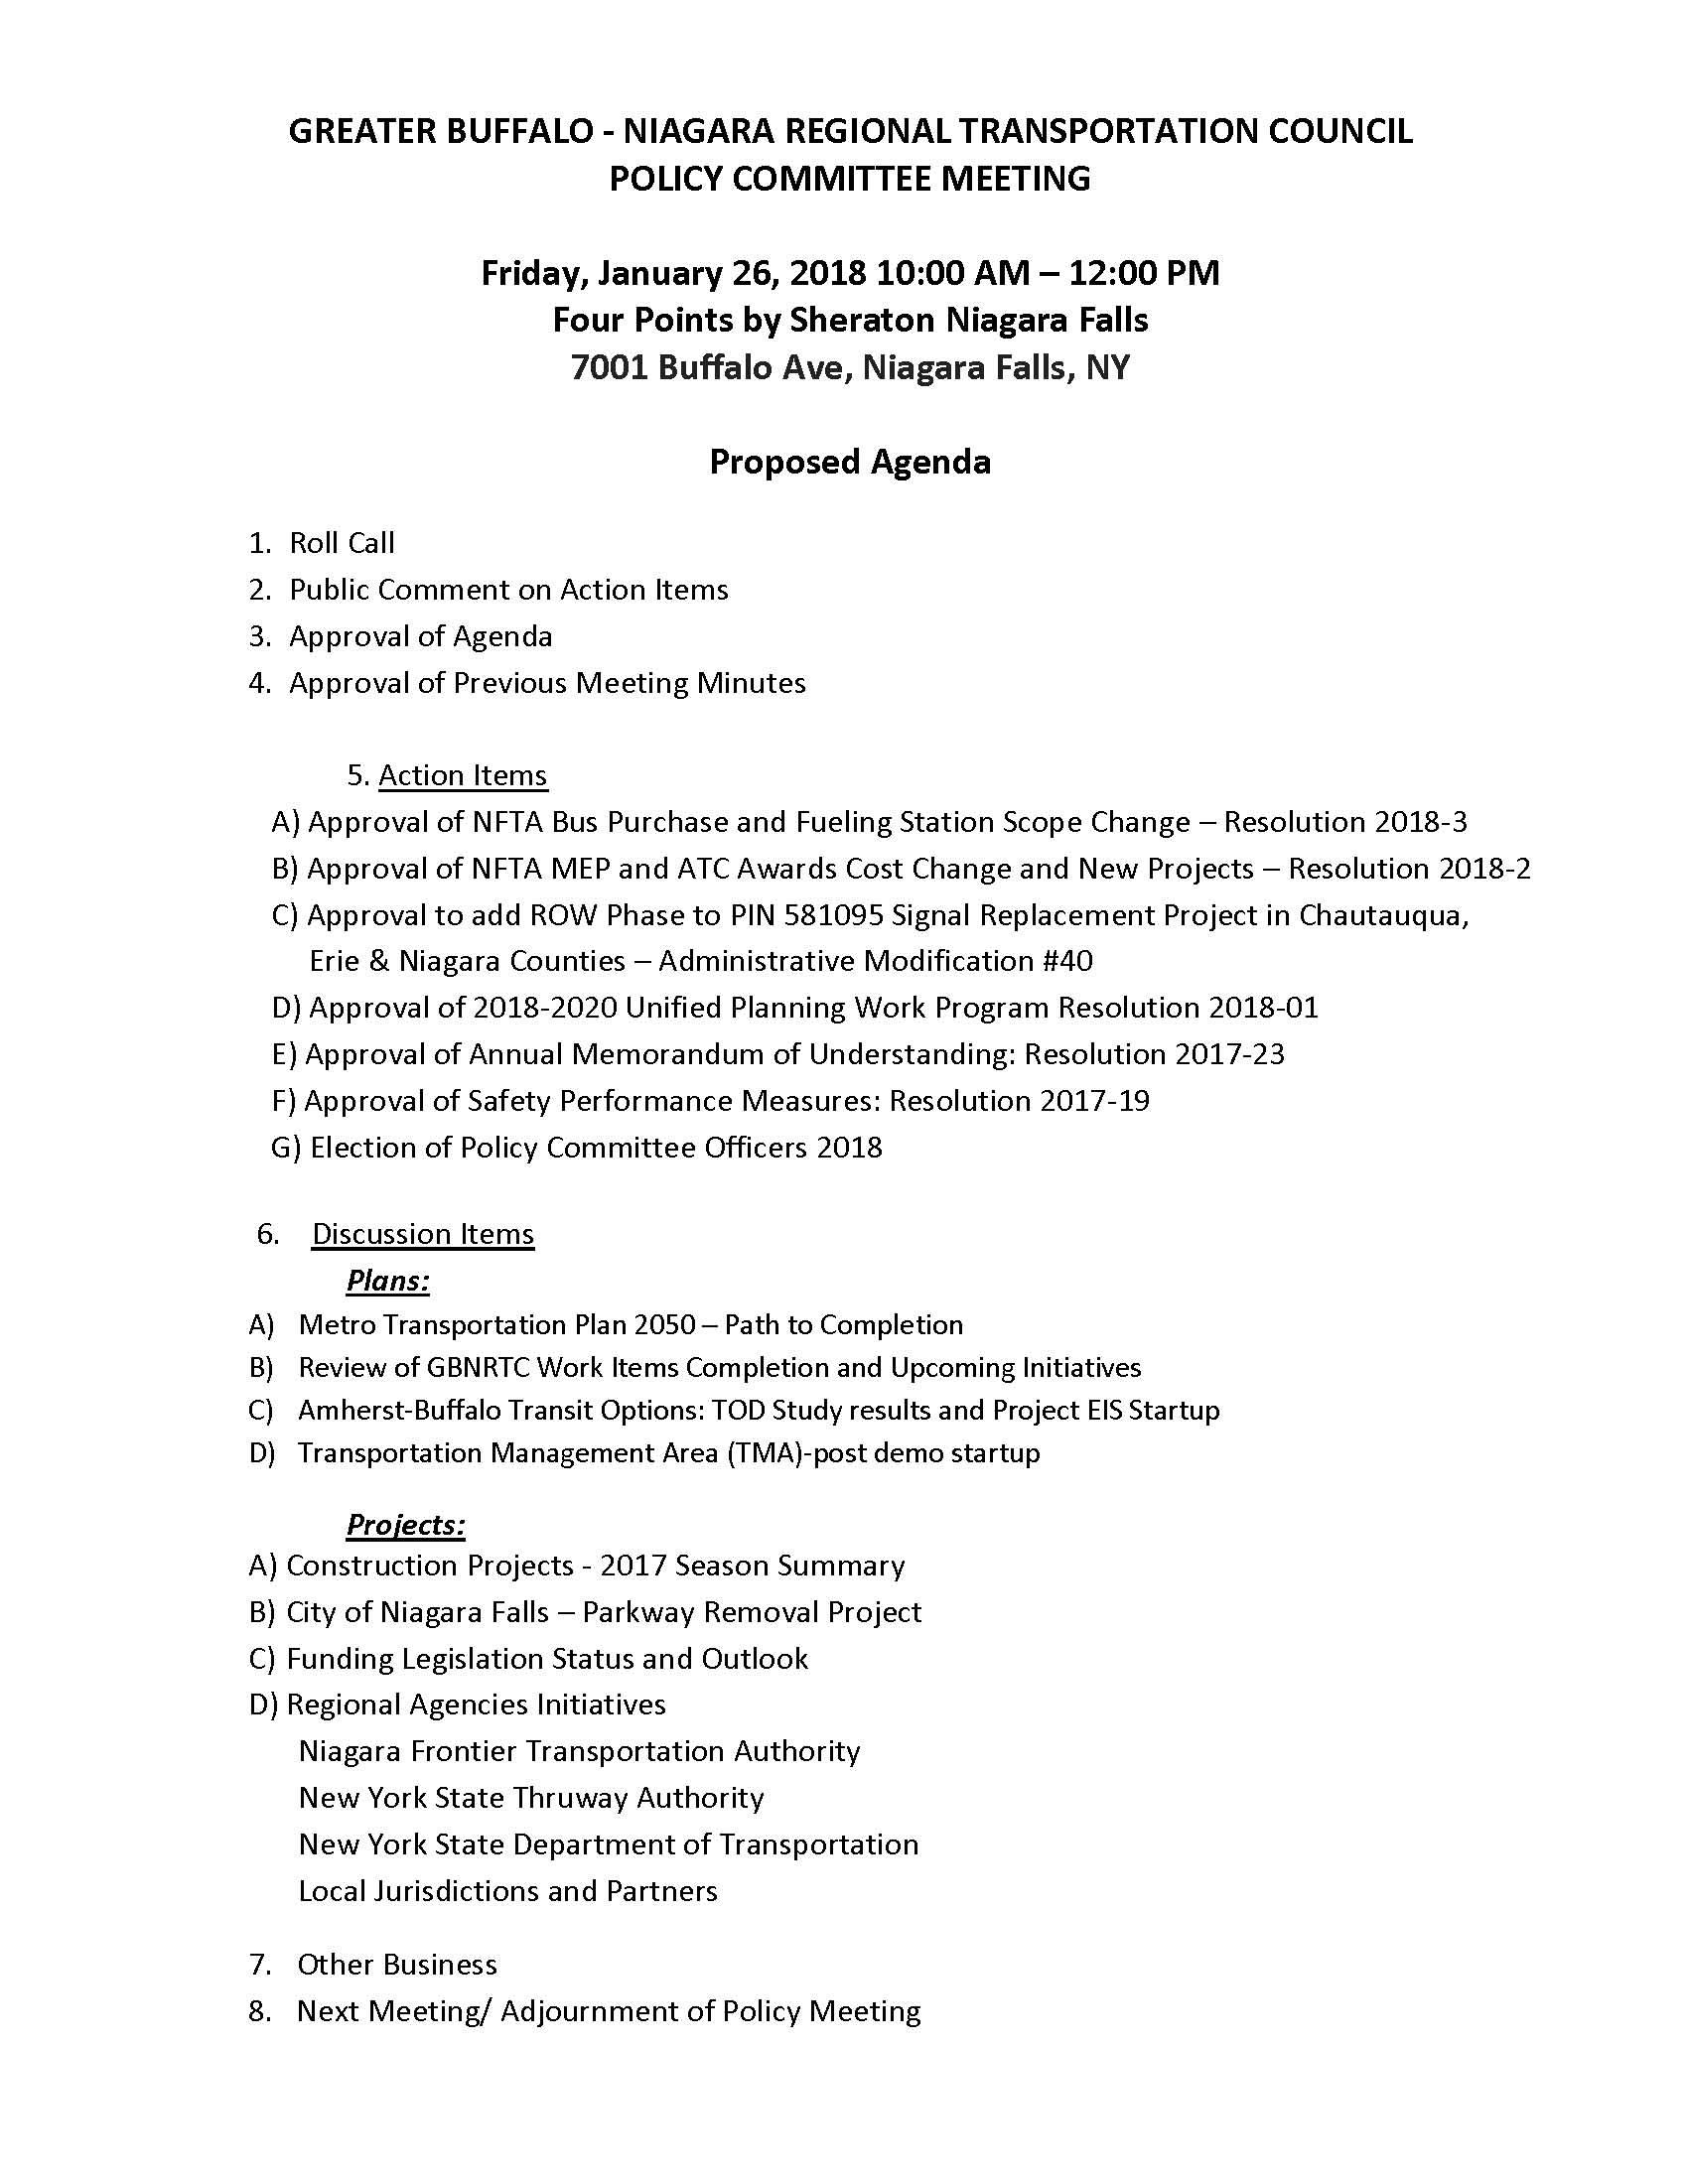 Policy Committee Draft Agenda - January 26, 2018